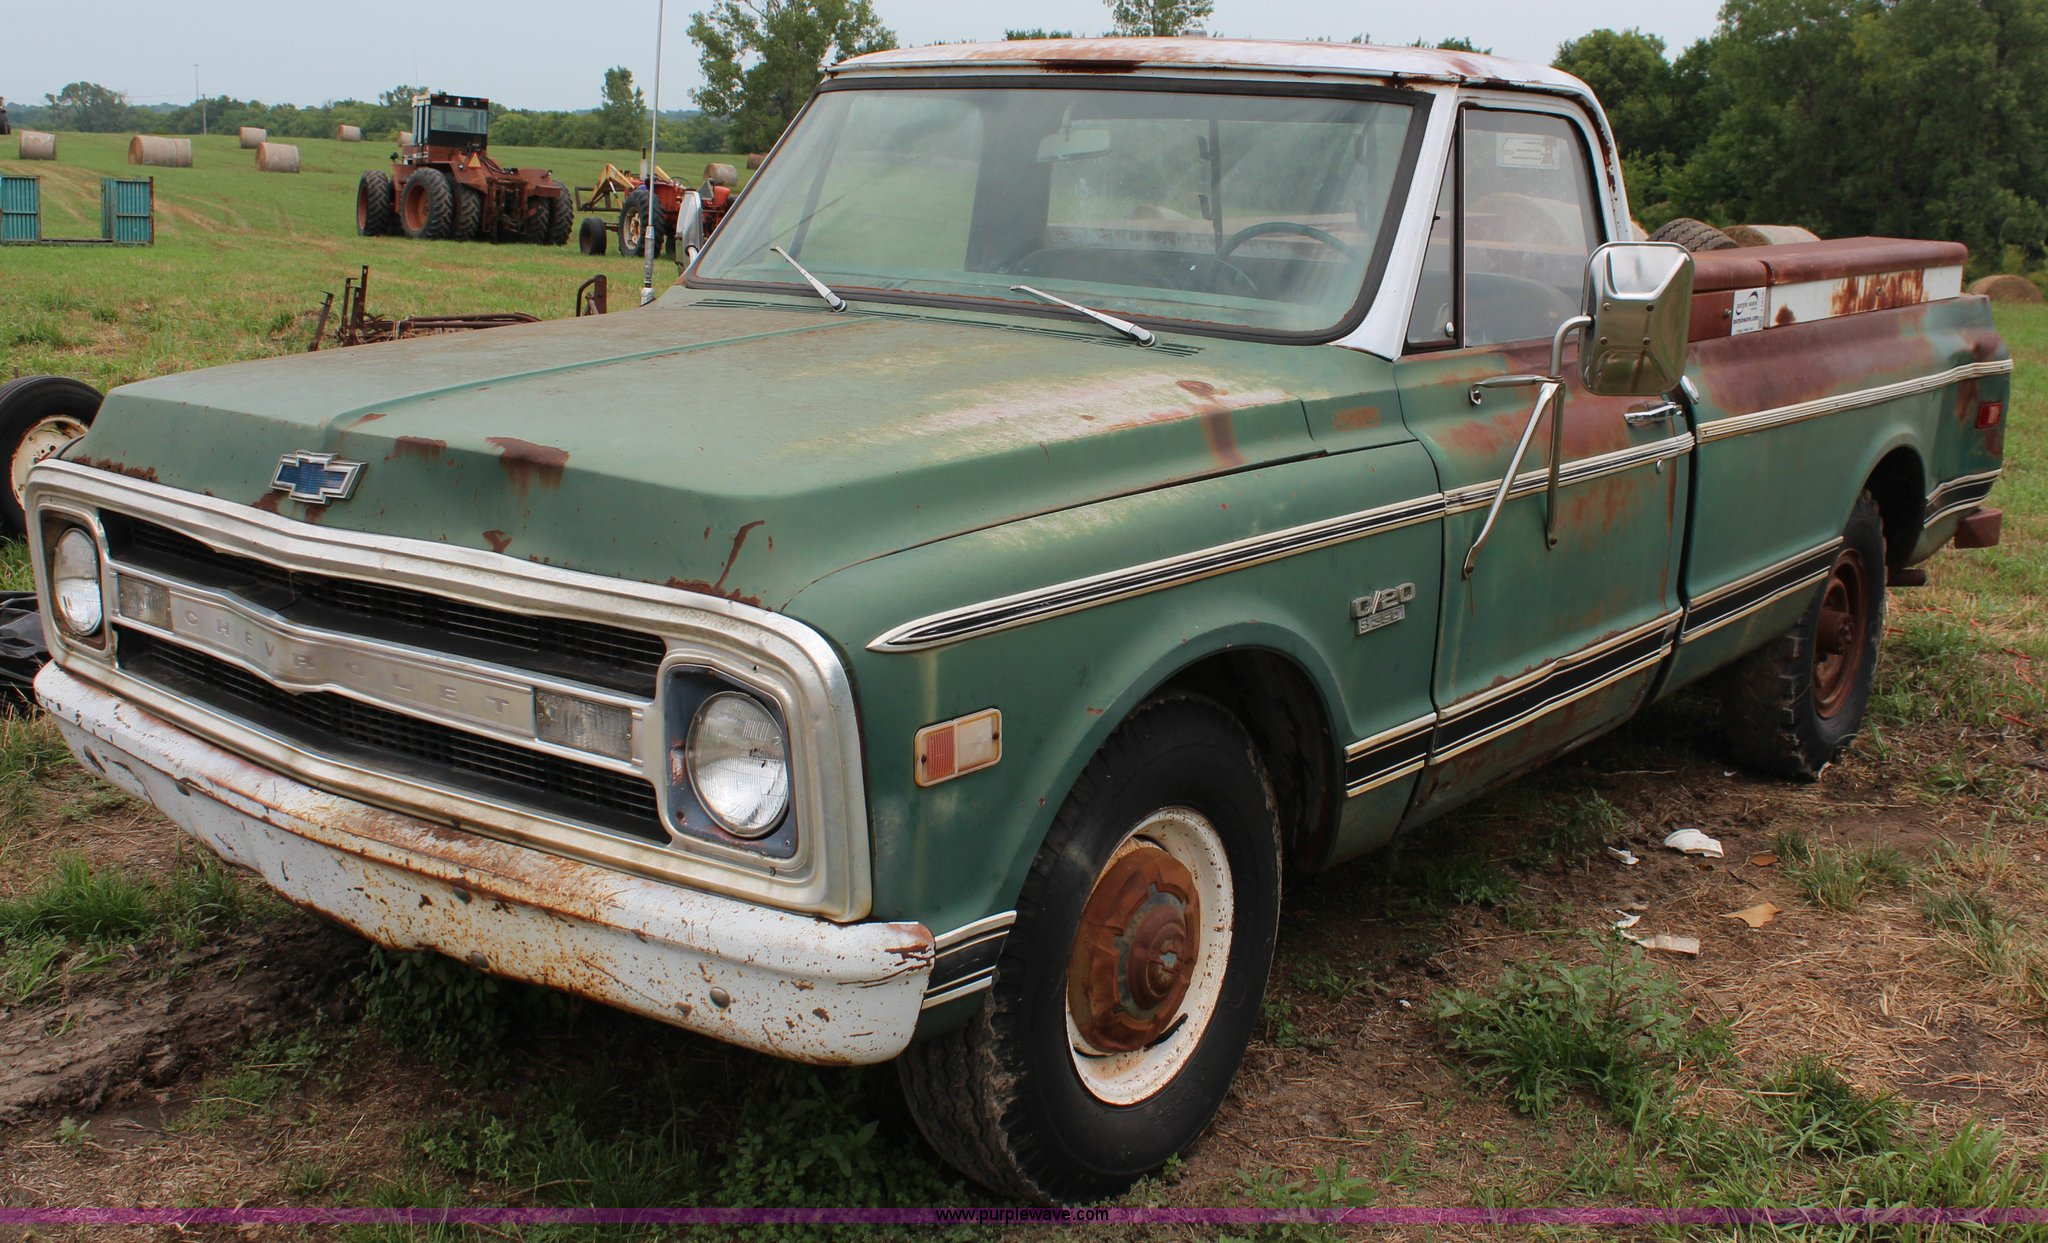 1969 chevrolet c20 pickup truck item j1016 sold septemb 1969 Chevy Trailblazer j1016 image for item j1016 1969 chevrolet c20